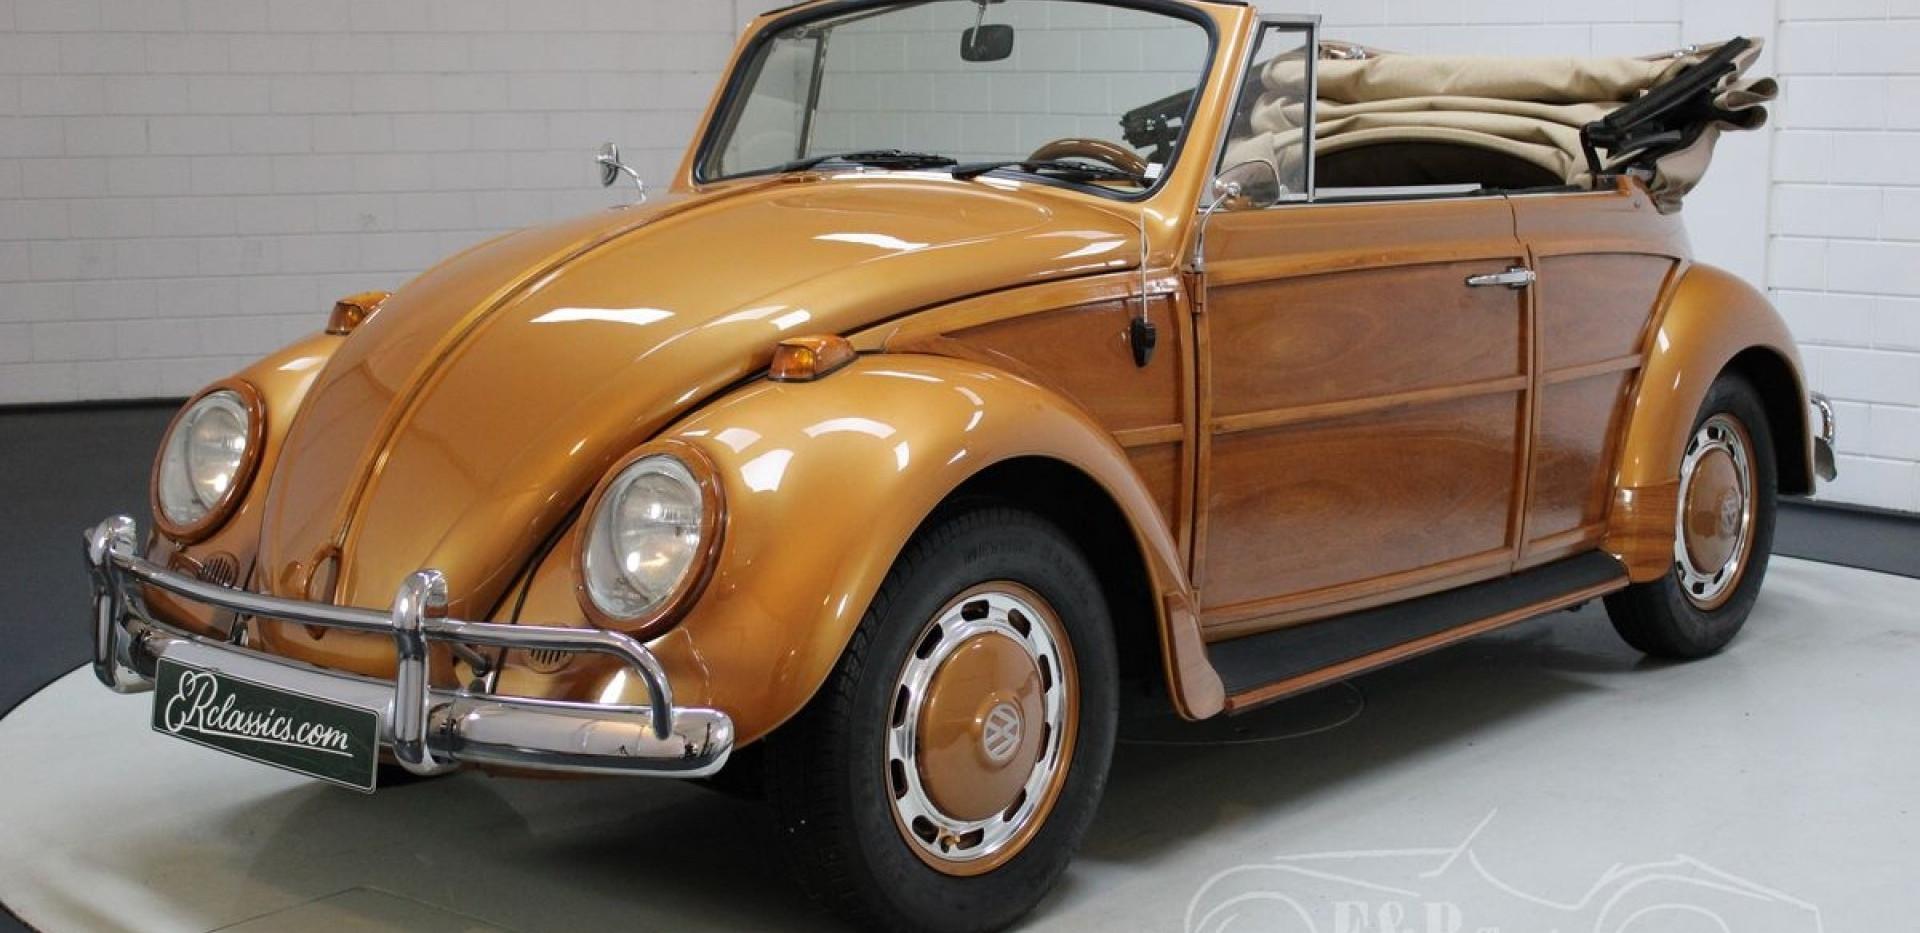 volkswagen-kever-woody-1966-v1273-042.jp